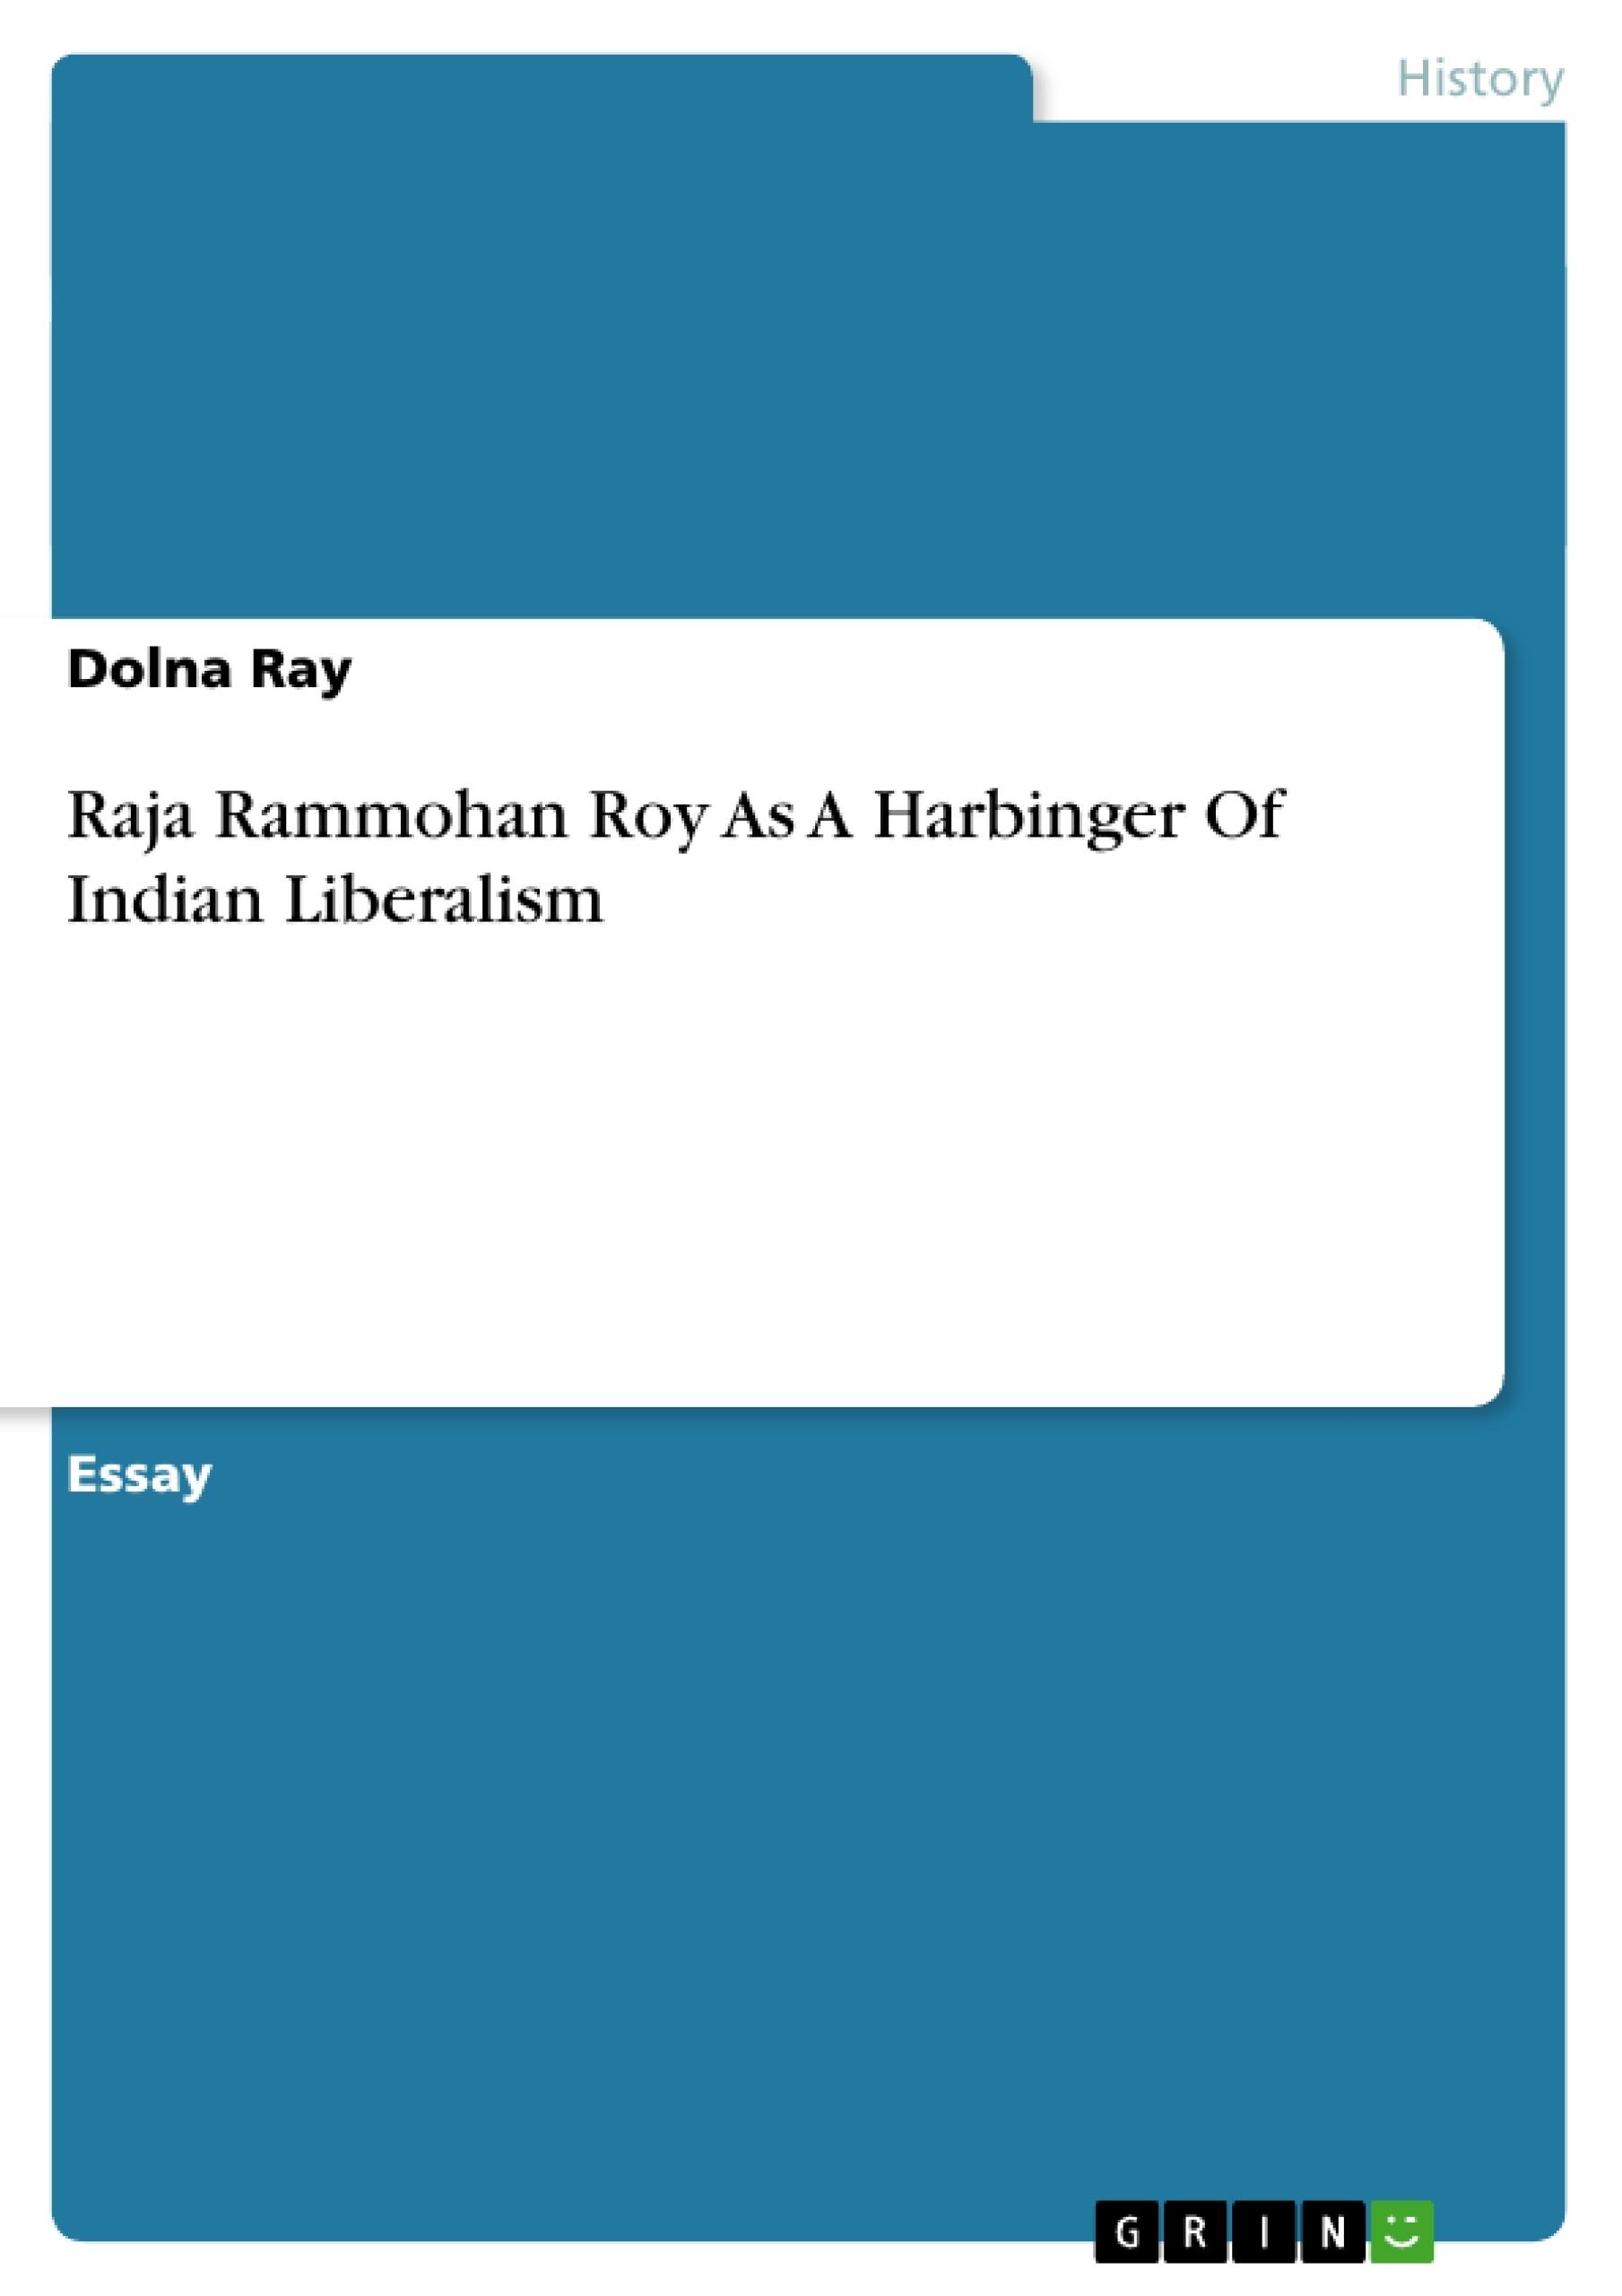 Title: Raja Rammohan Roy As A Harbinger Of Indian Liberalism